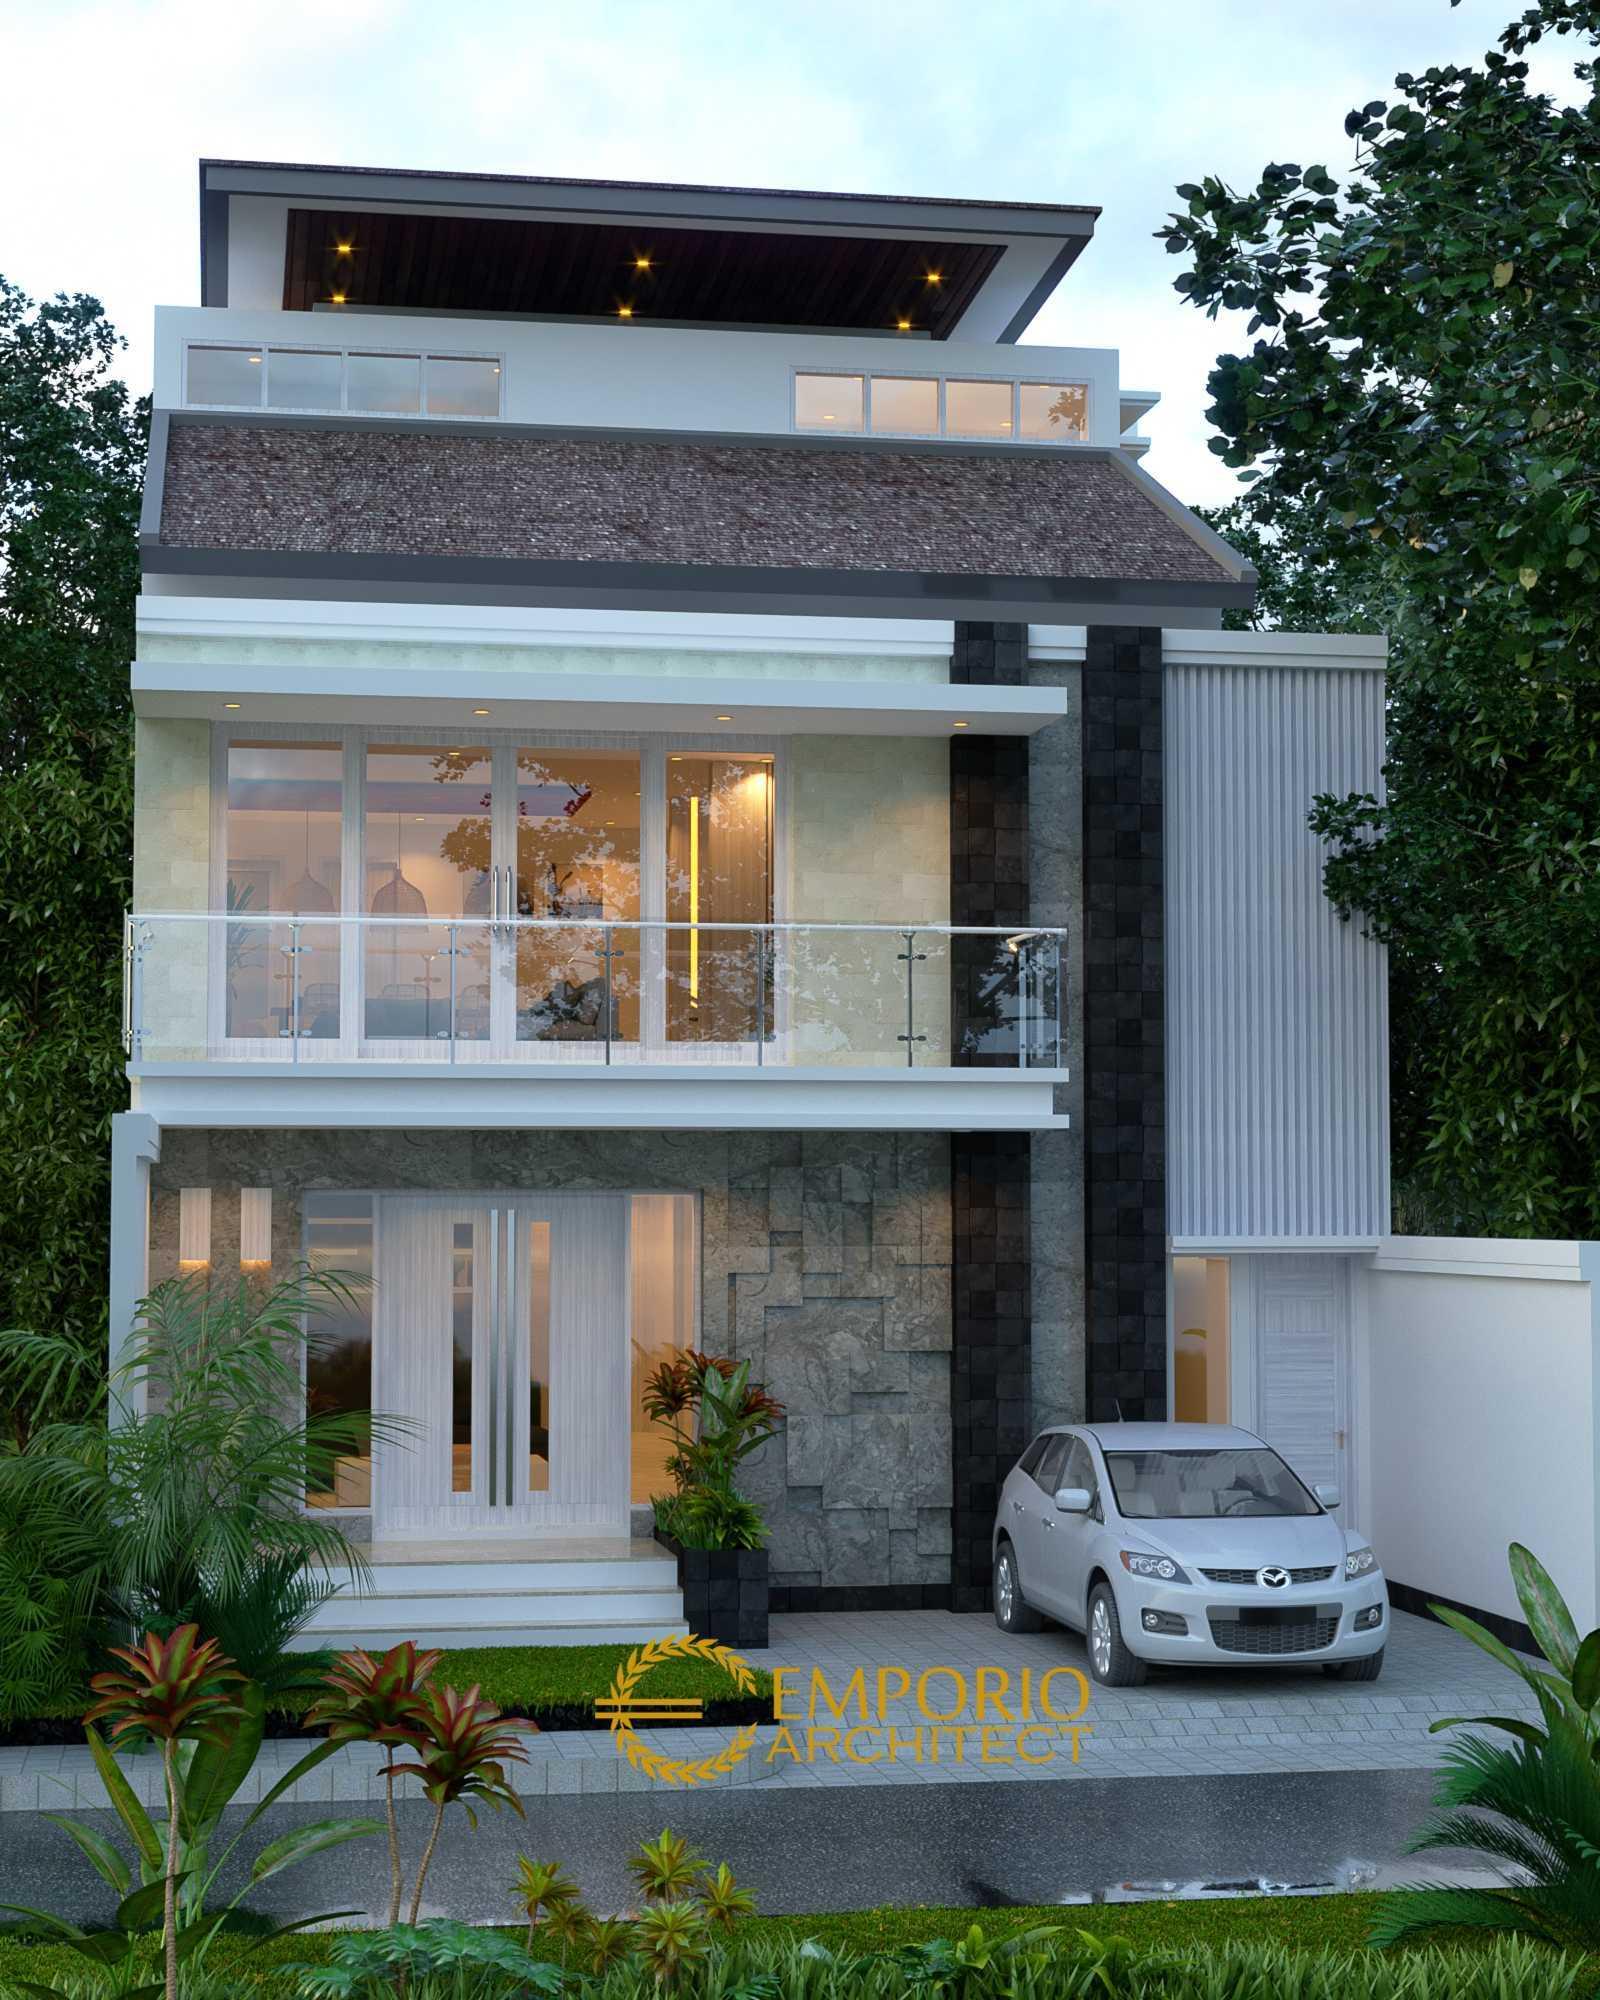 Emporio Architect Jasa Arsitek Makassar Desain Rumah Modern Tropis 633 @ Makassar Makassar, Kota Makassar, Sulawesi Selatan, Indonesia Makassar, Kota Makassar, Sulawesi Selatan, Indonesia Emporio-Architect-Jasa-Arsitek-Makassar-Desain-Rumah-Modern-Tropis-633-Makassar Modern 78984